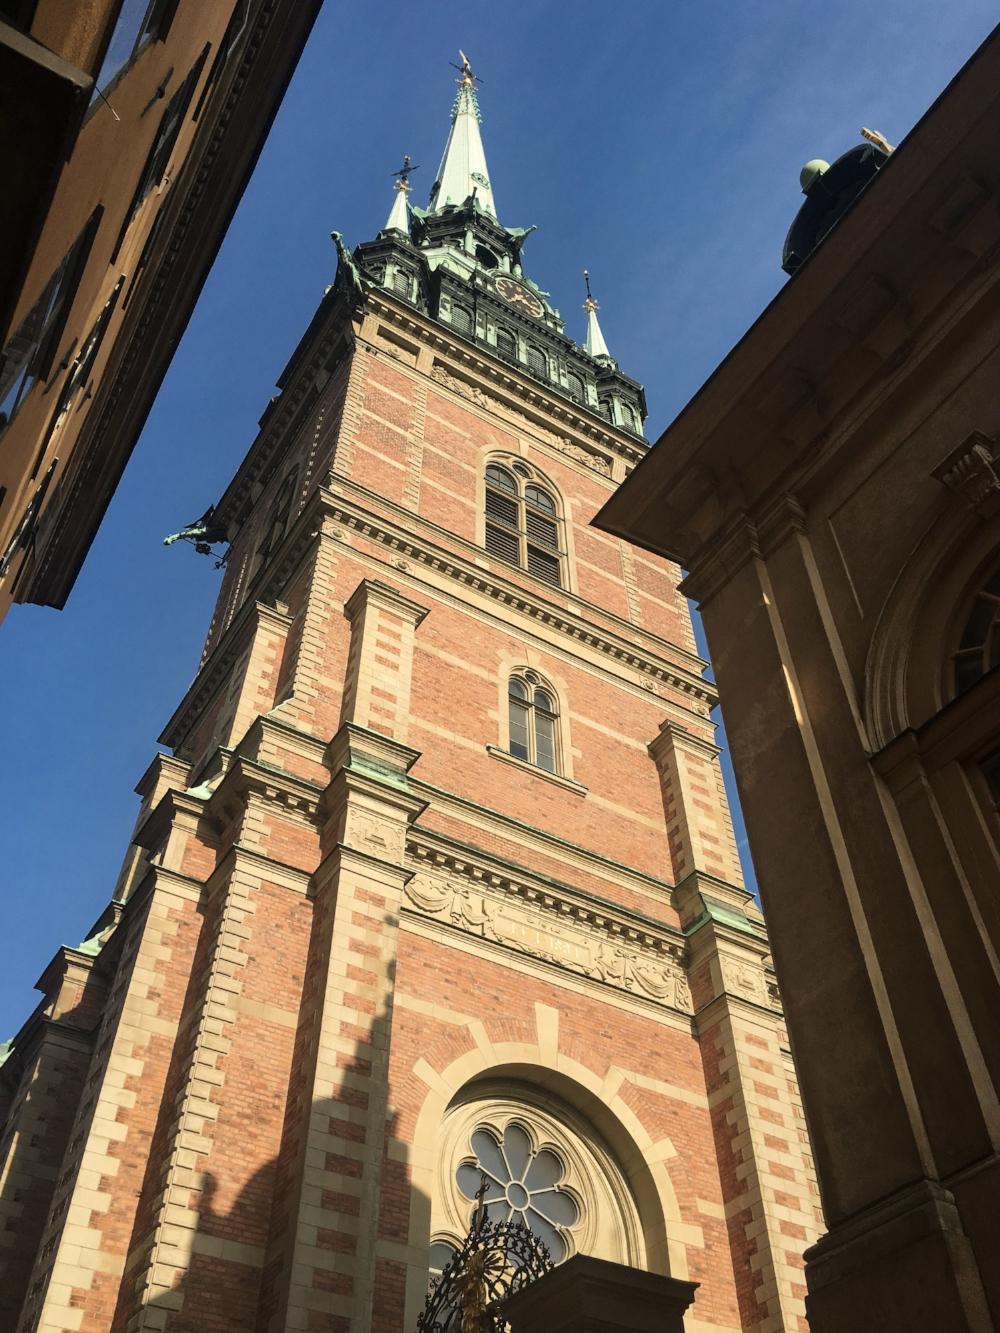 curio.trips.sweden.stockholm.gamla.stan.church.iphone.jpg